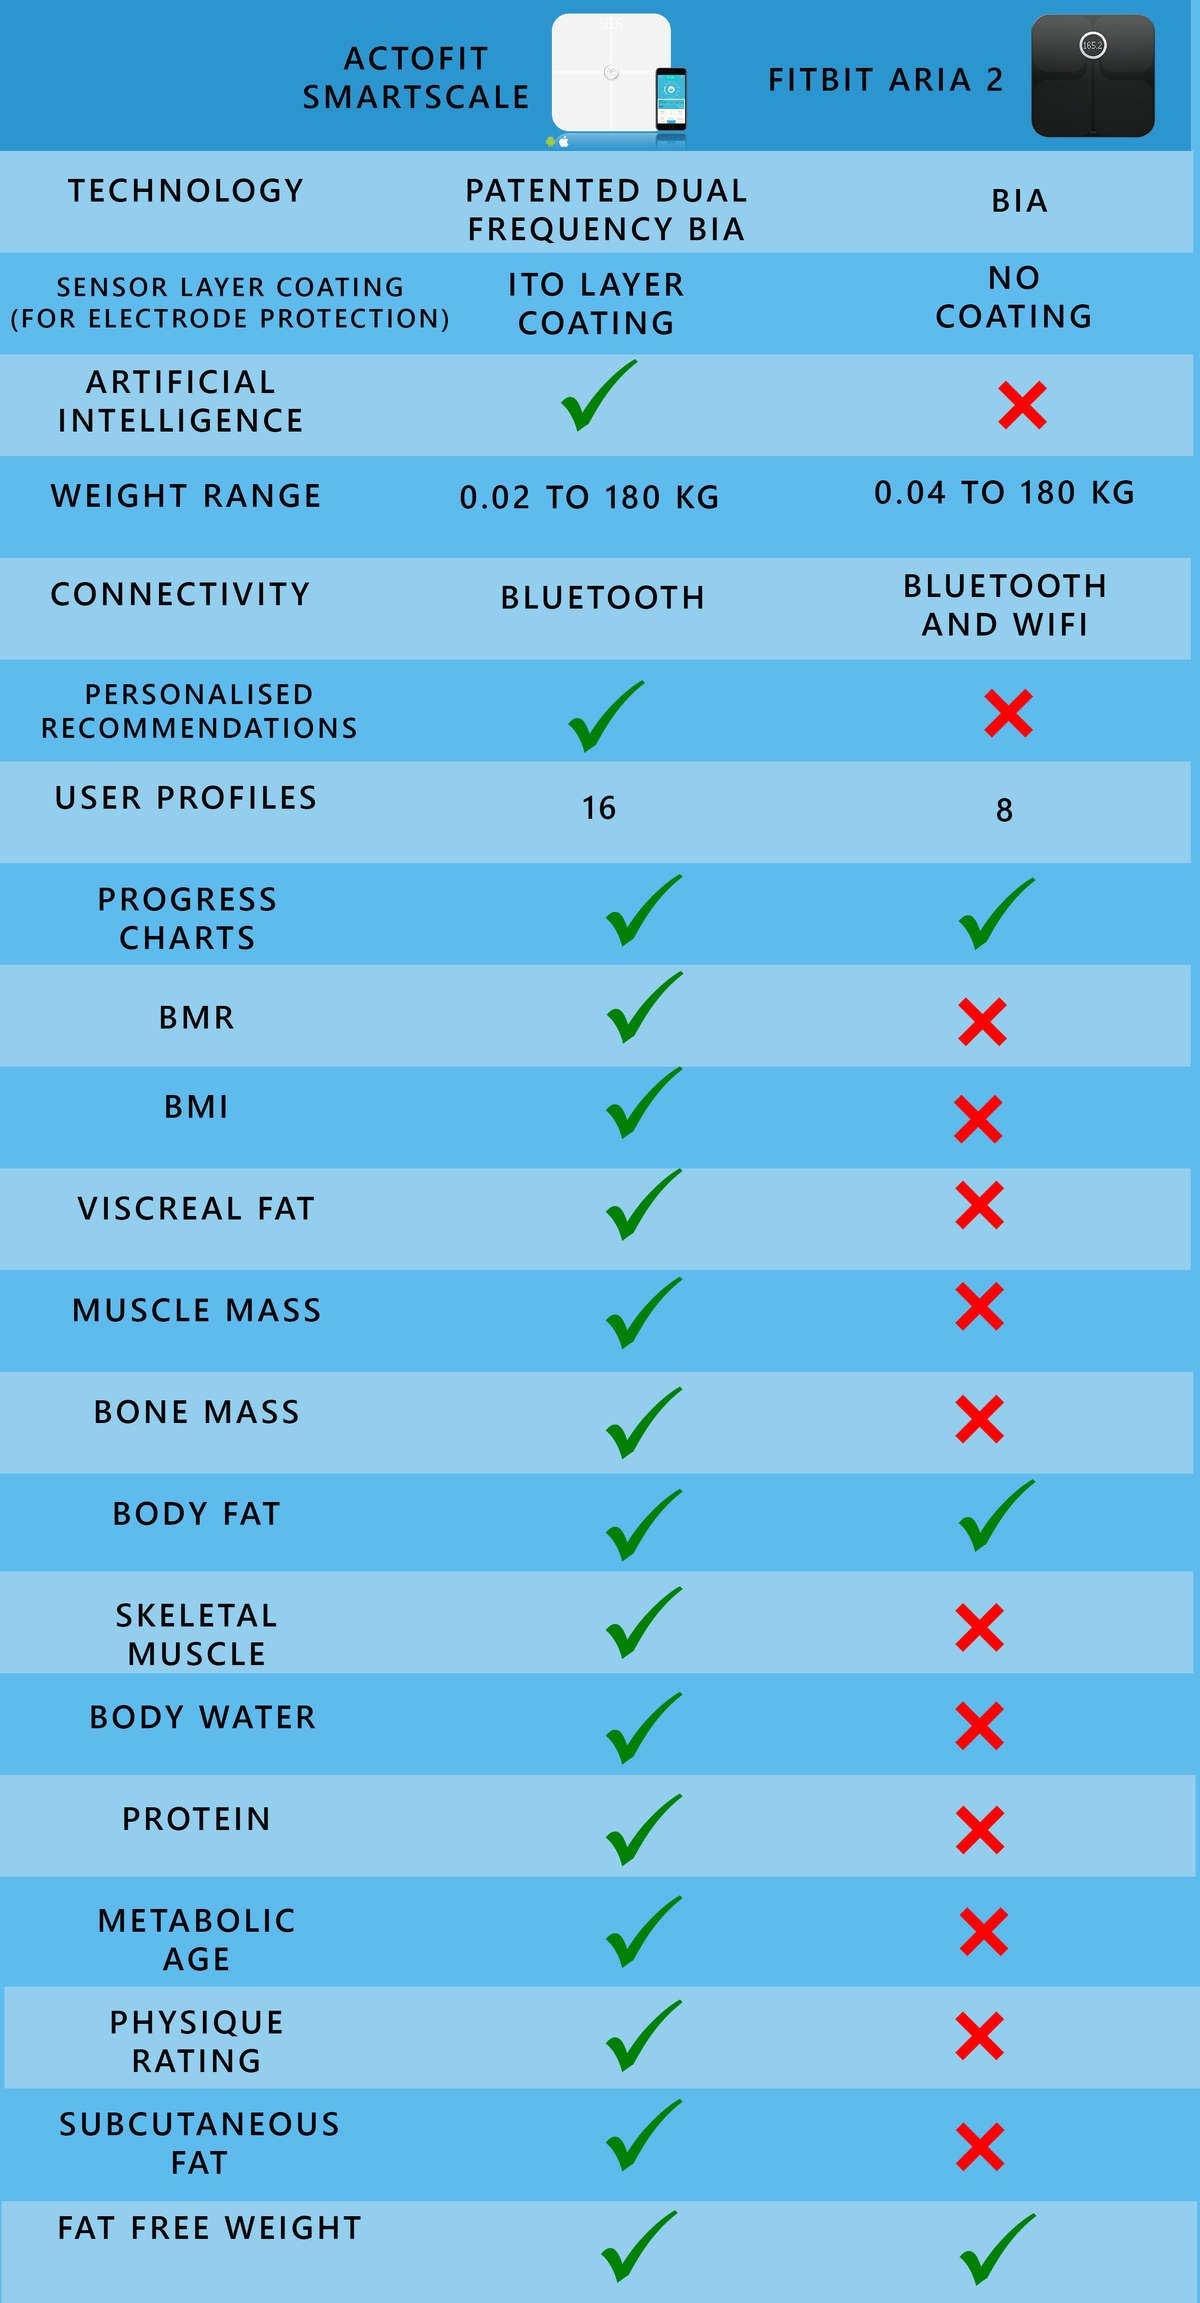 Xiaomi vs Actofit